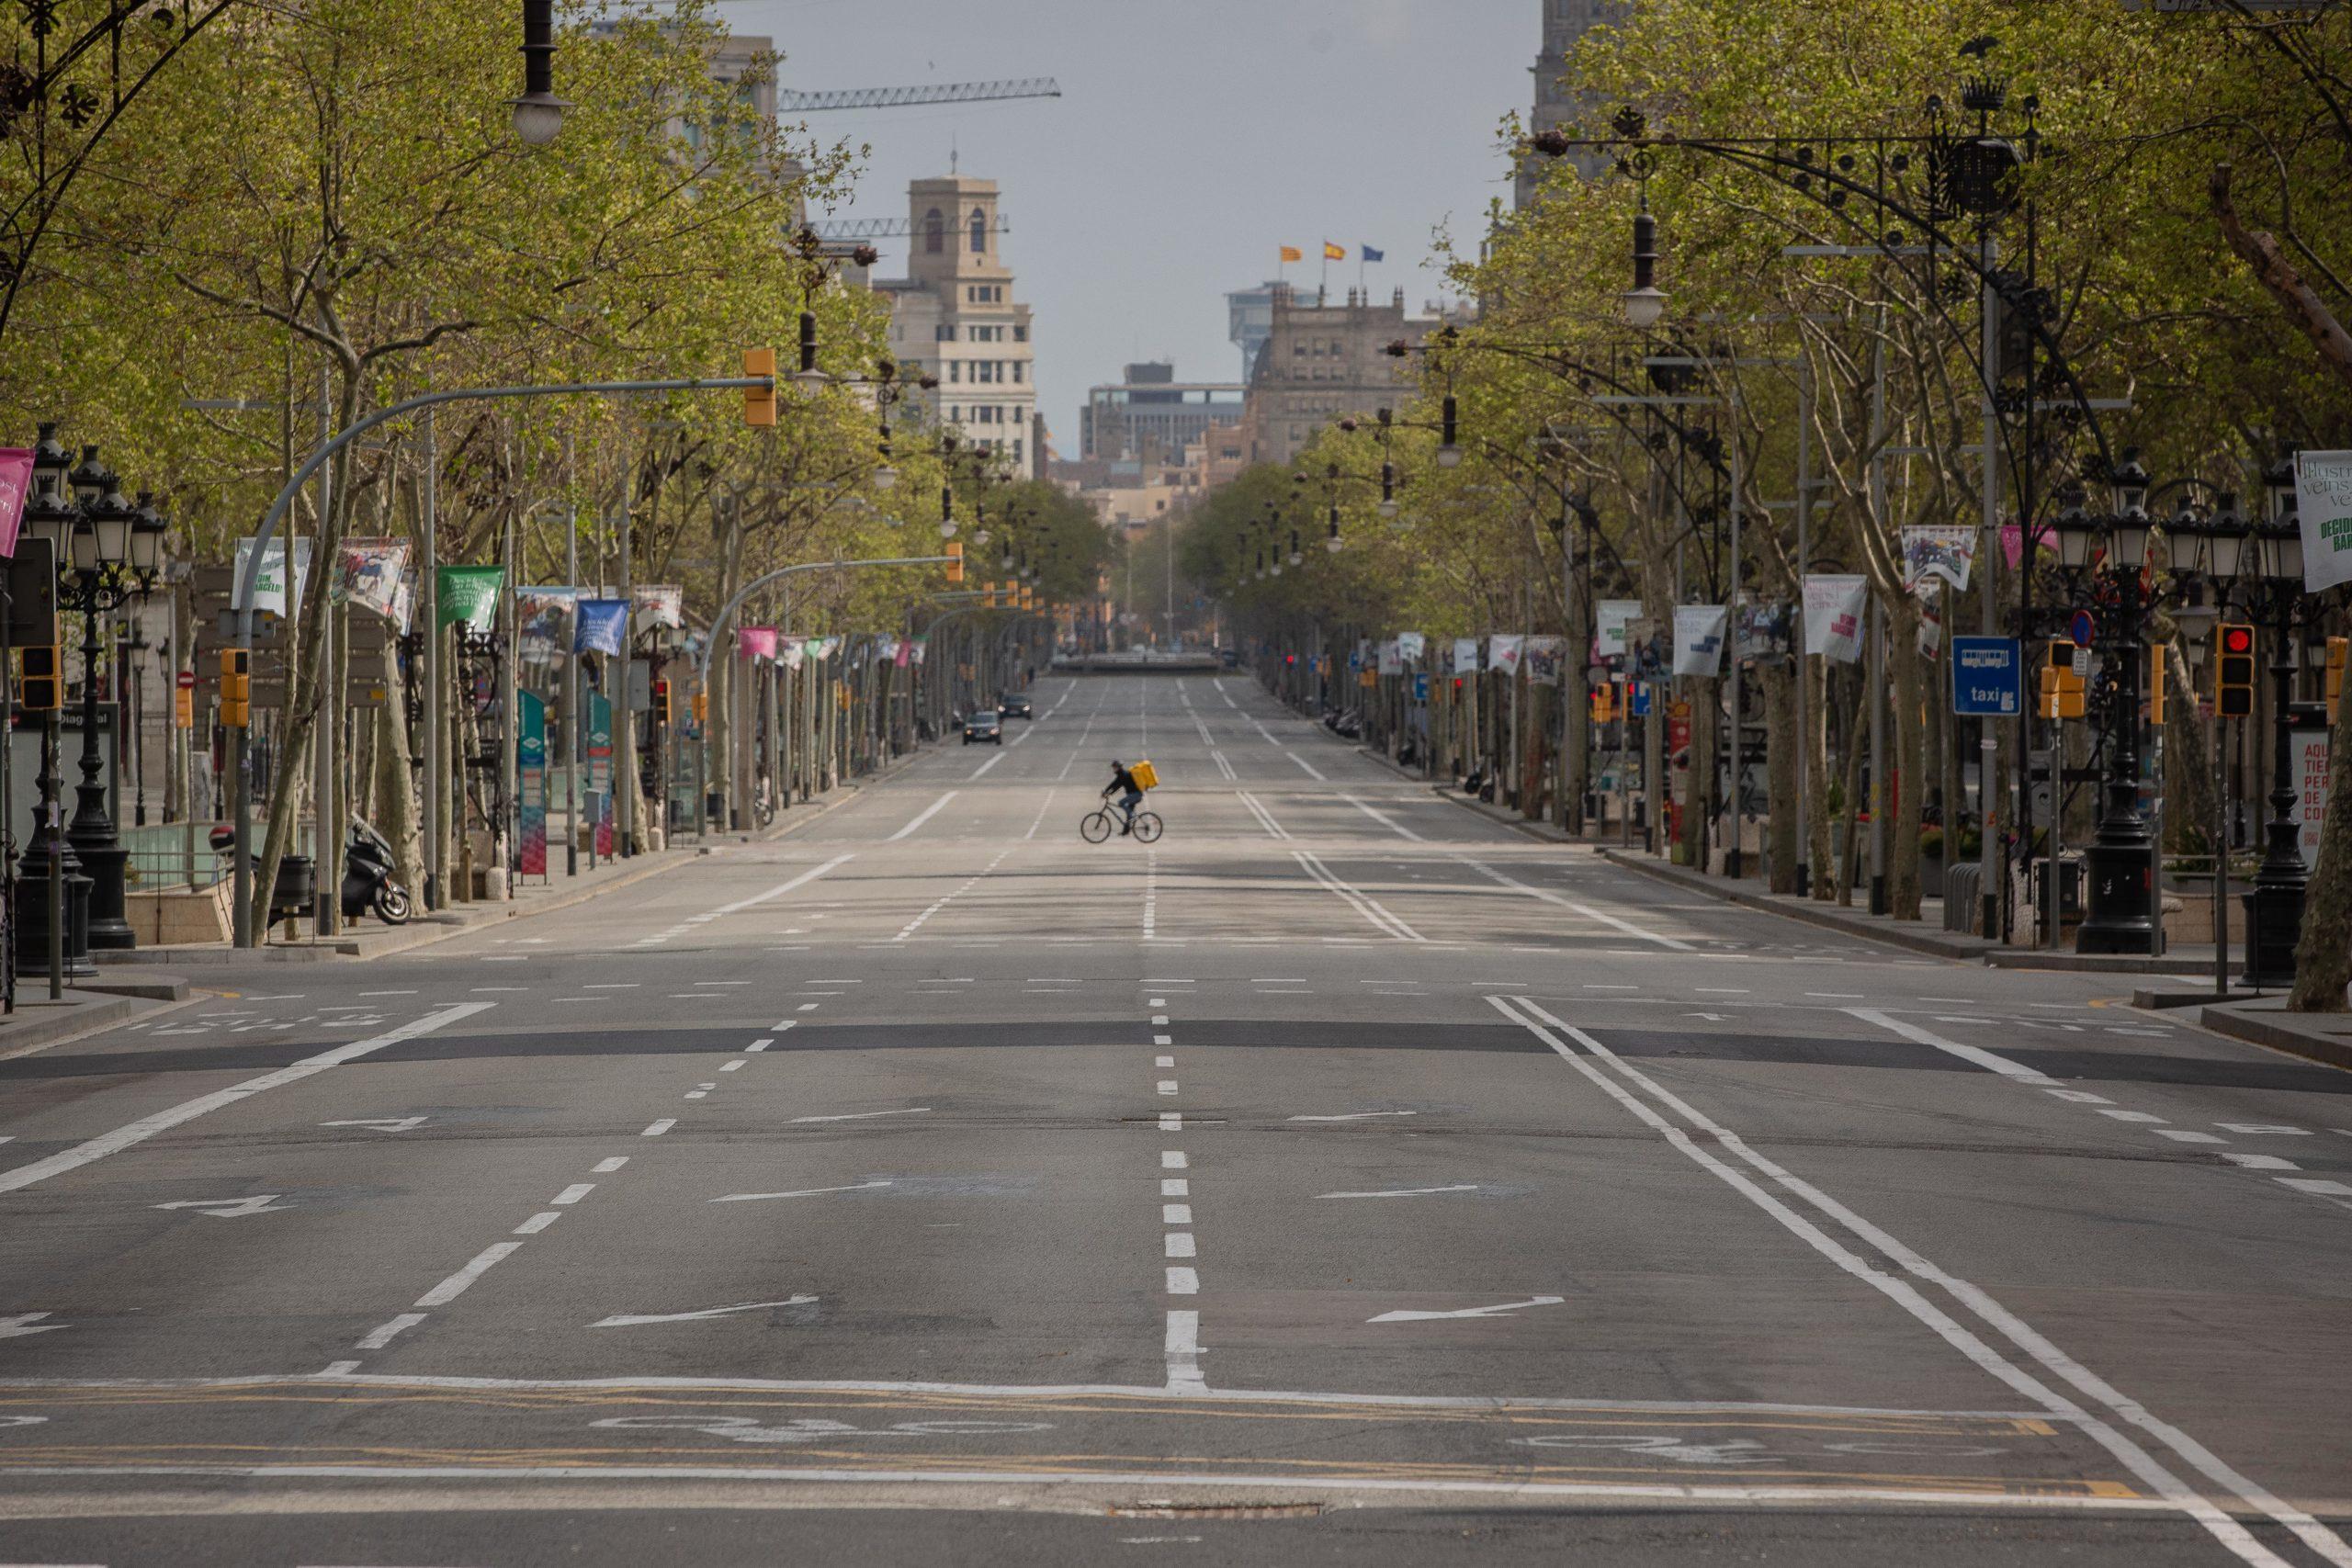 Un repartidor de Glovo en bicicleta, rei del passeig de Gràcia buit, durant l'estat d'alarma a Barcelona pel coronavirus / David Zorrakino - Europa Press